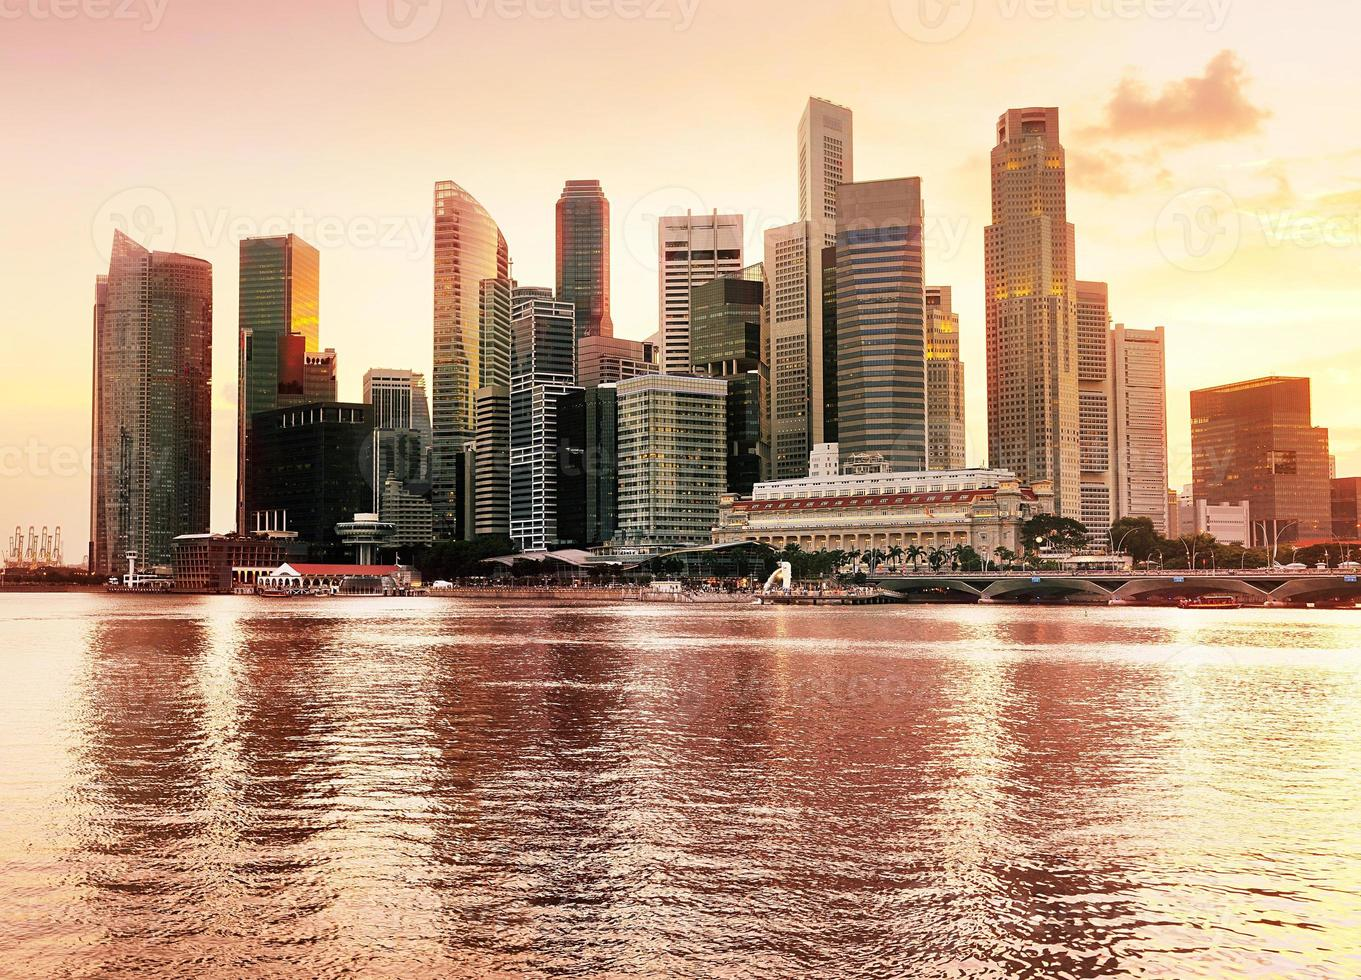 Singapore downtown view photo